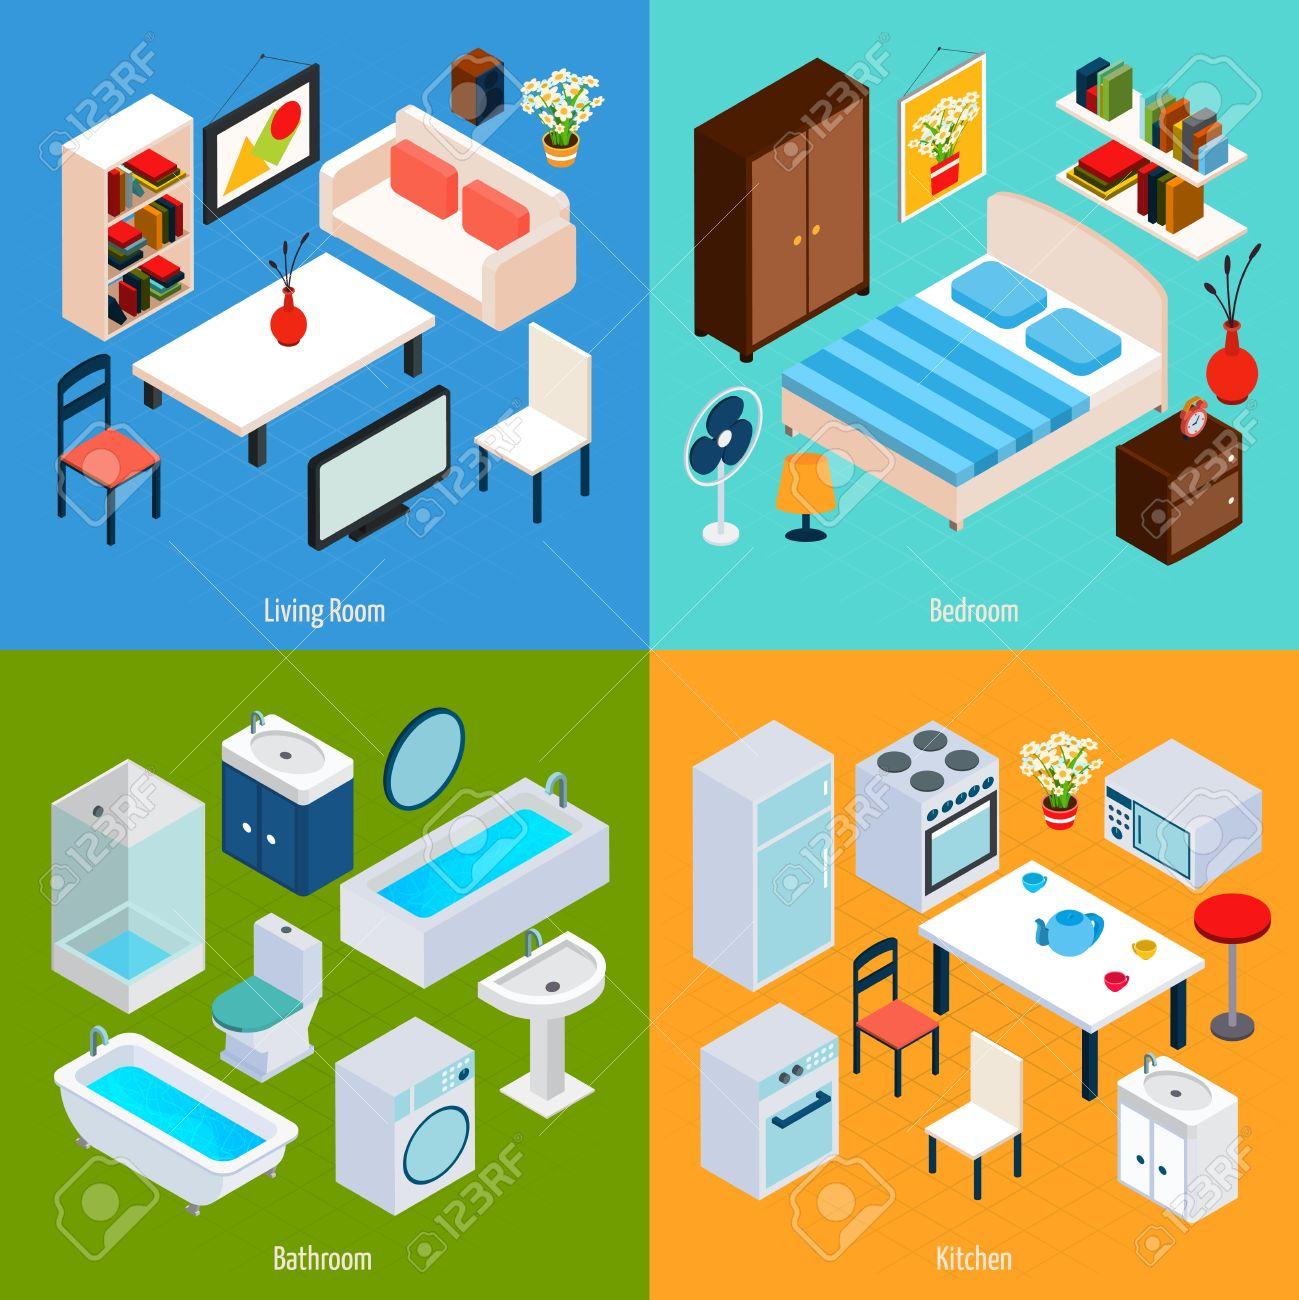 Living Room Bedroom Bathroom Kitchen. Isometric Interior Design Concept Set With Living Room Bedroom Bathroom And Kitchen 3d Icons Isolated Vector